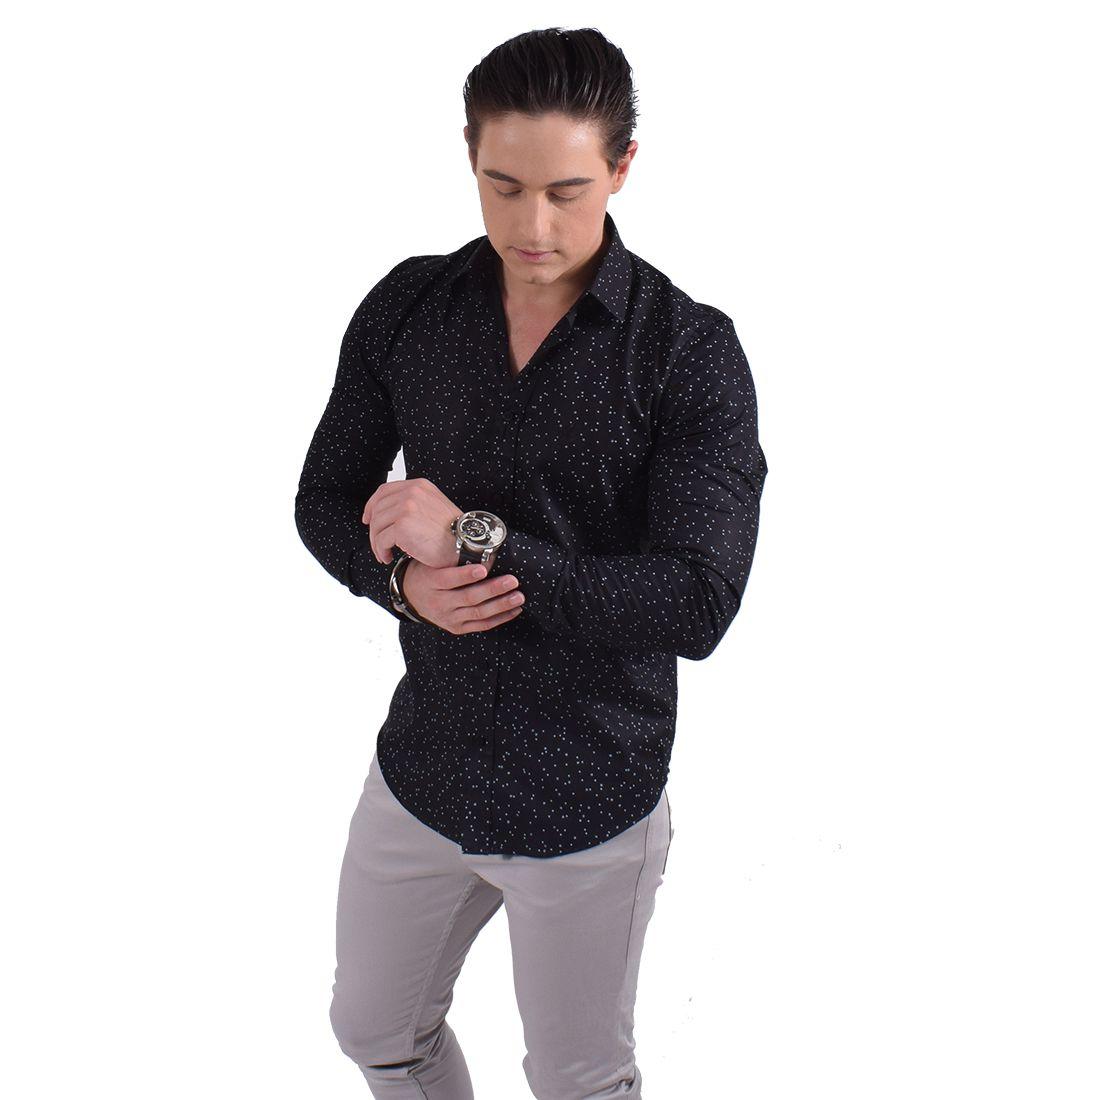 100237 - Camisa Social Masculina Slim Estampada - LEVOK